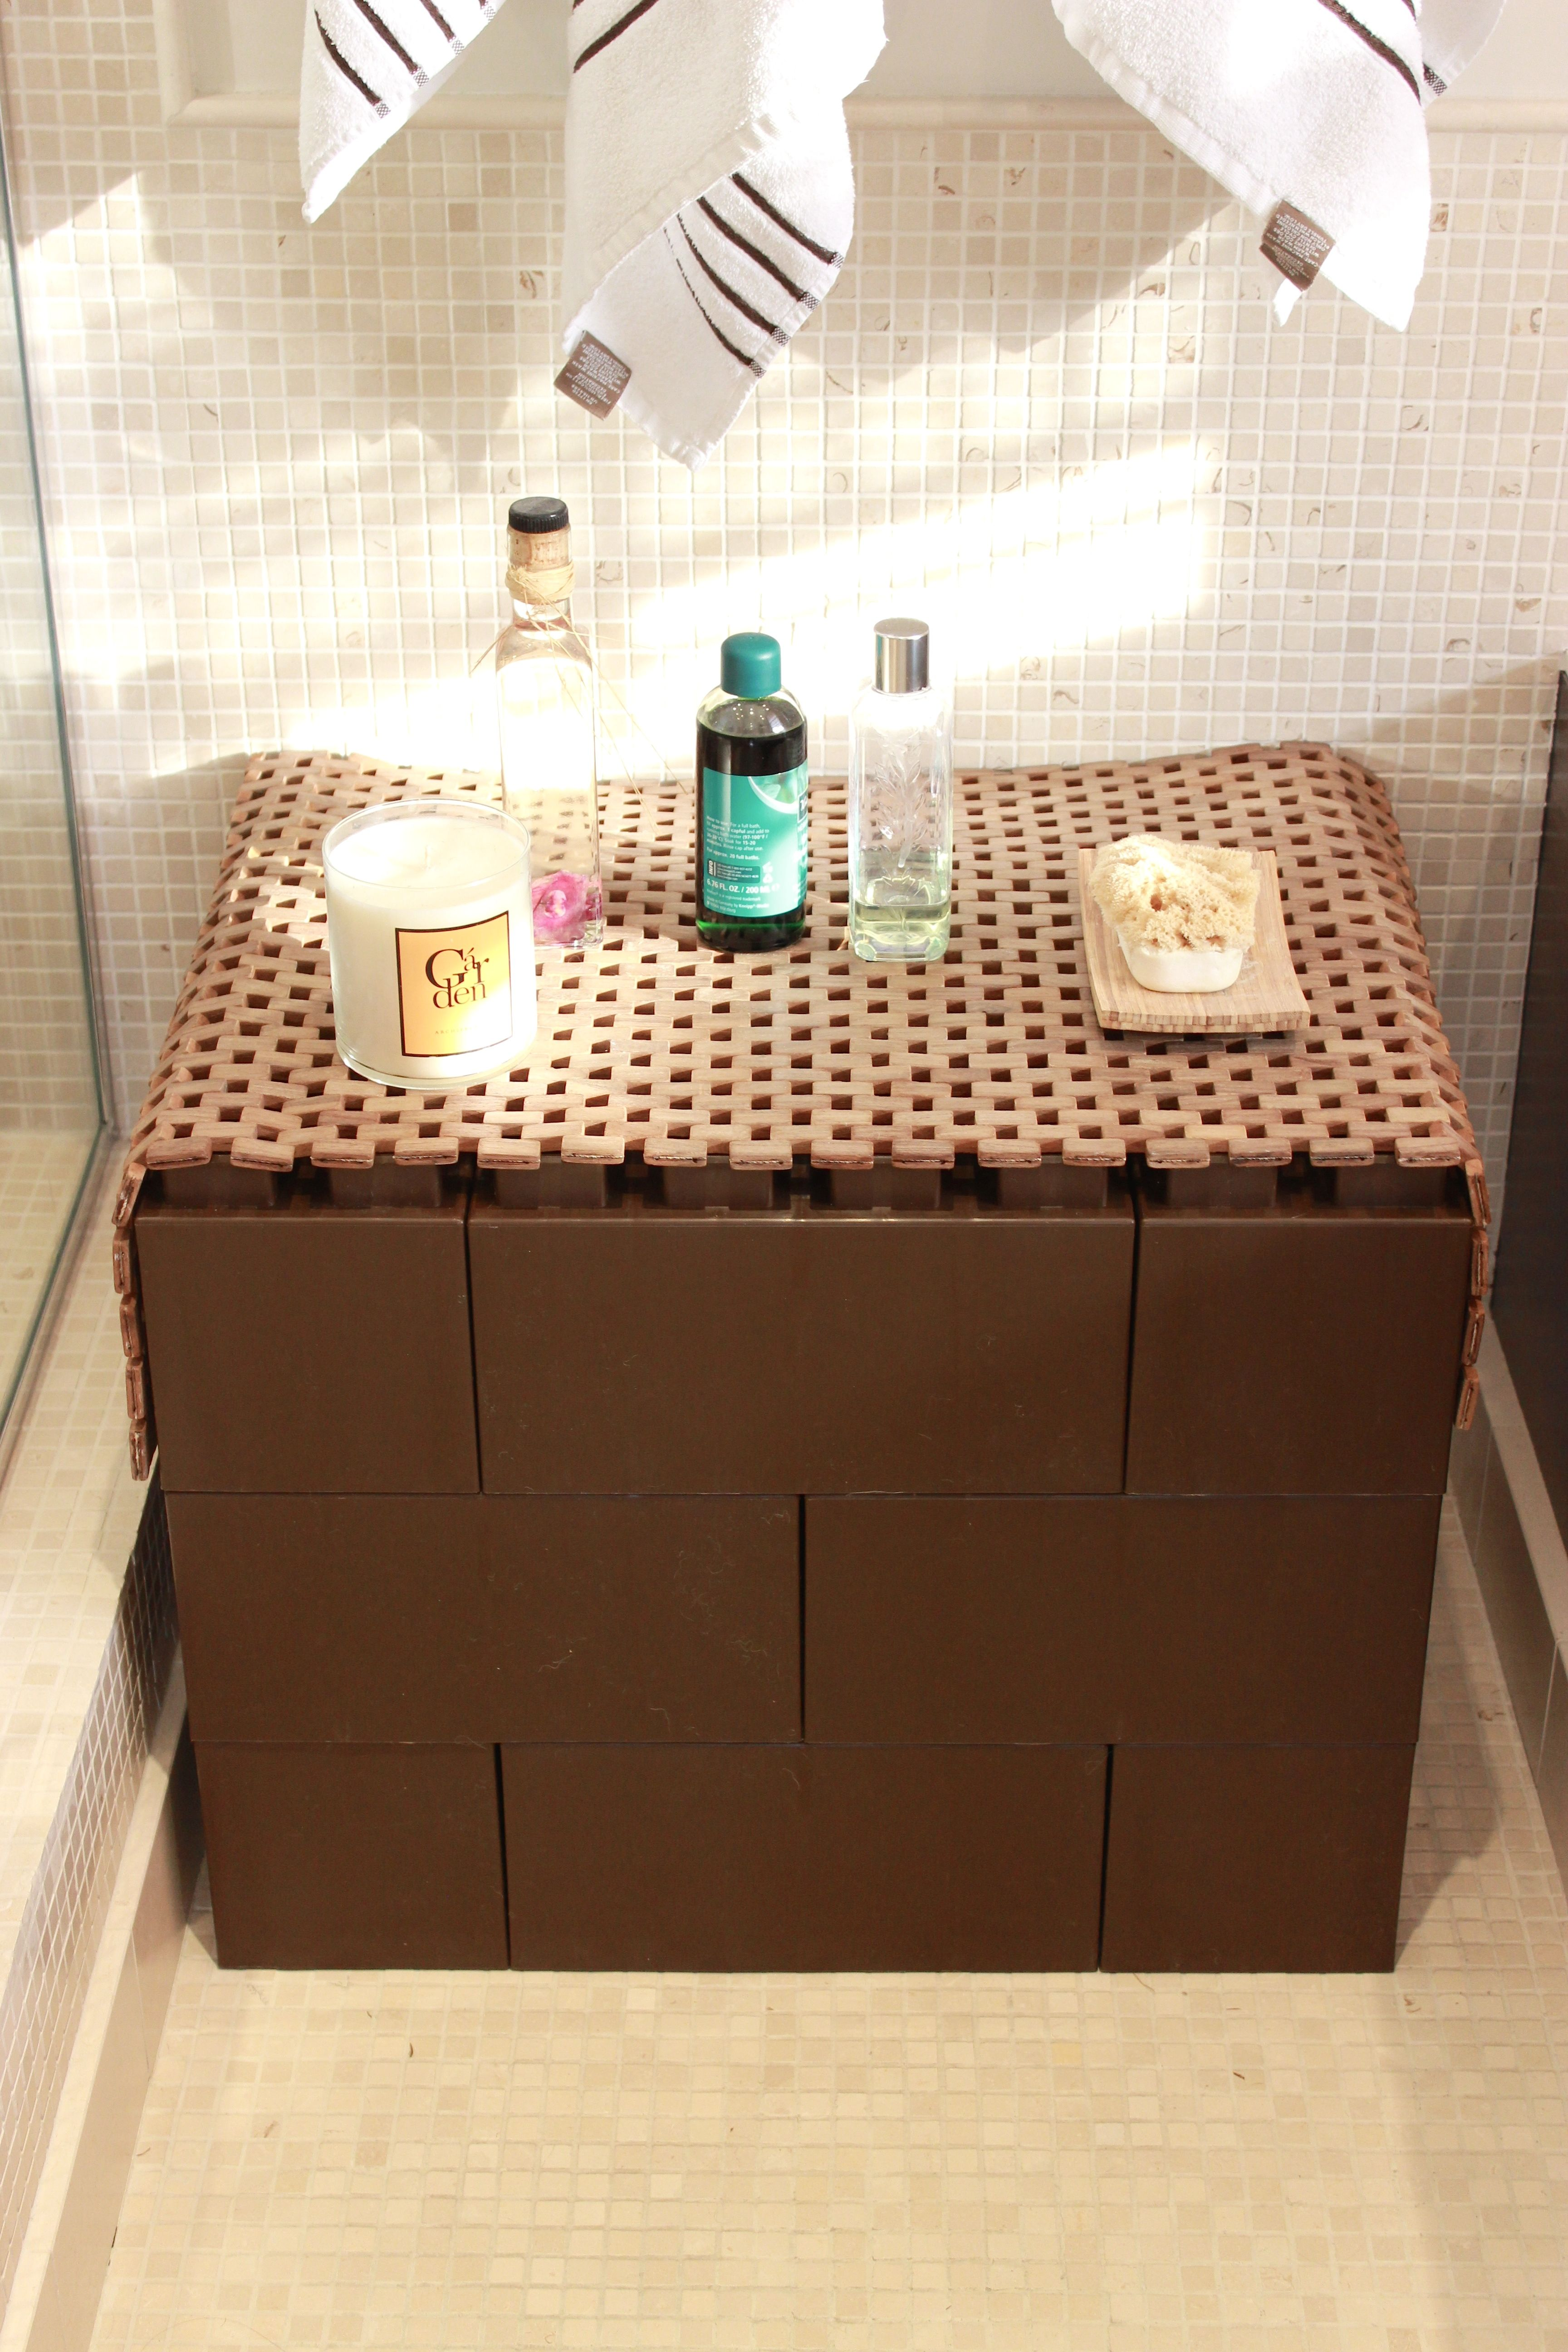 Waterproof Table For Bathroom Built Using Everblock Modular